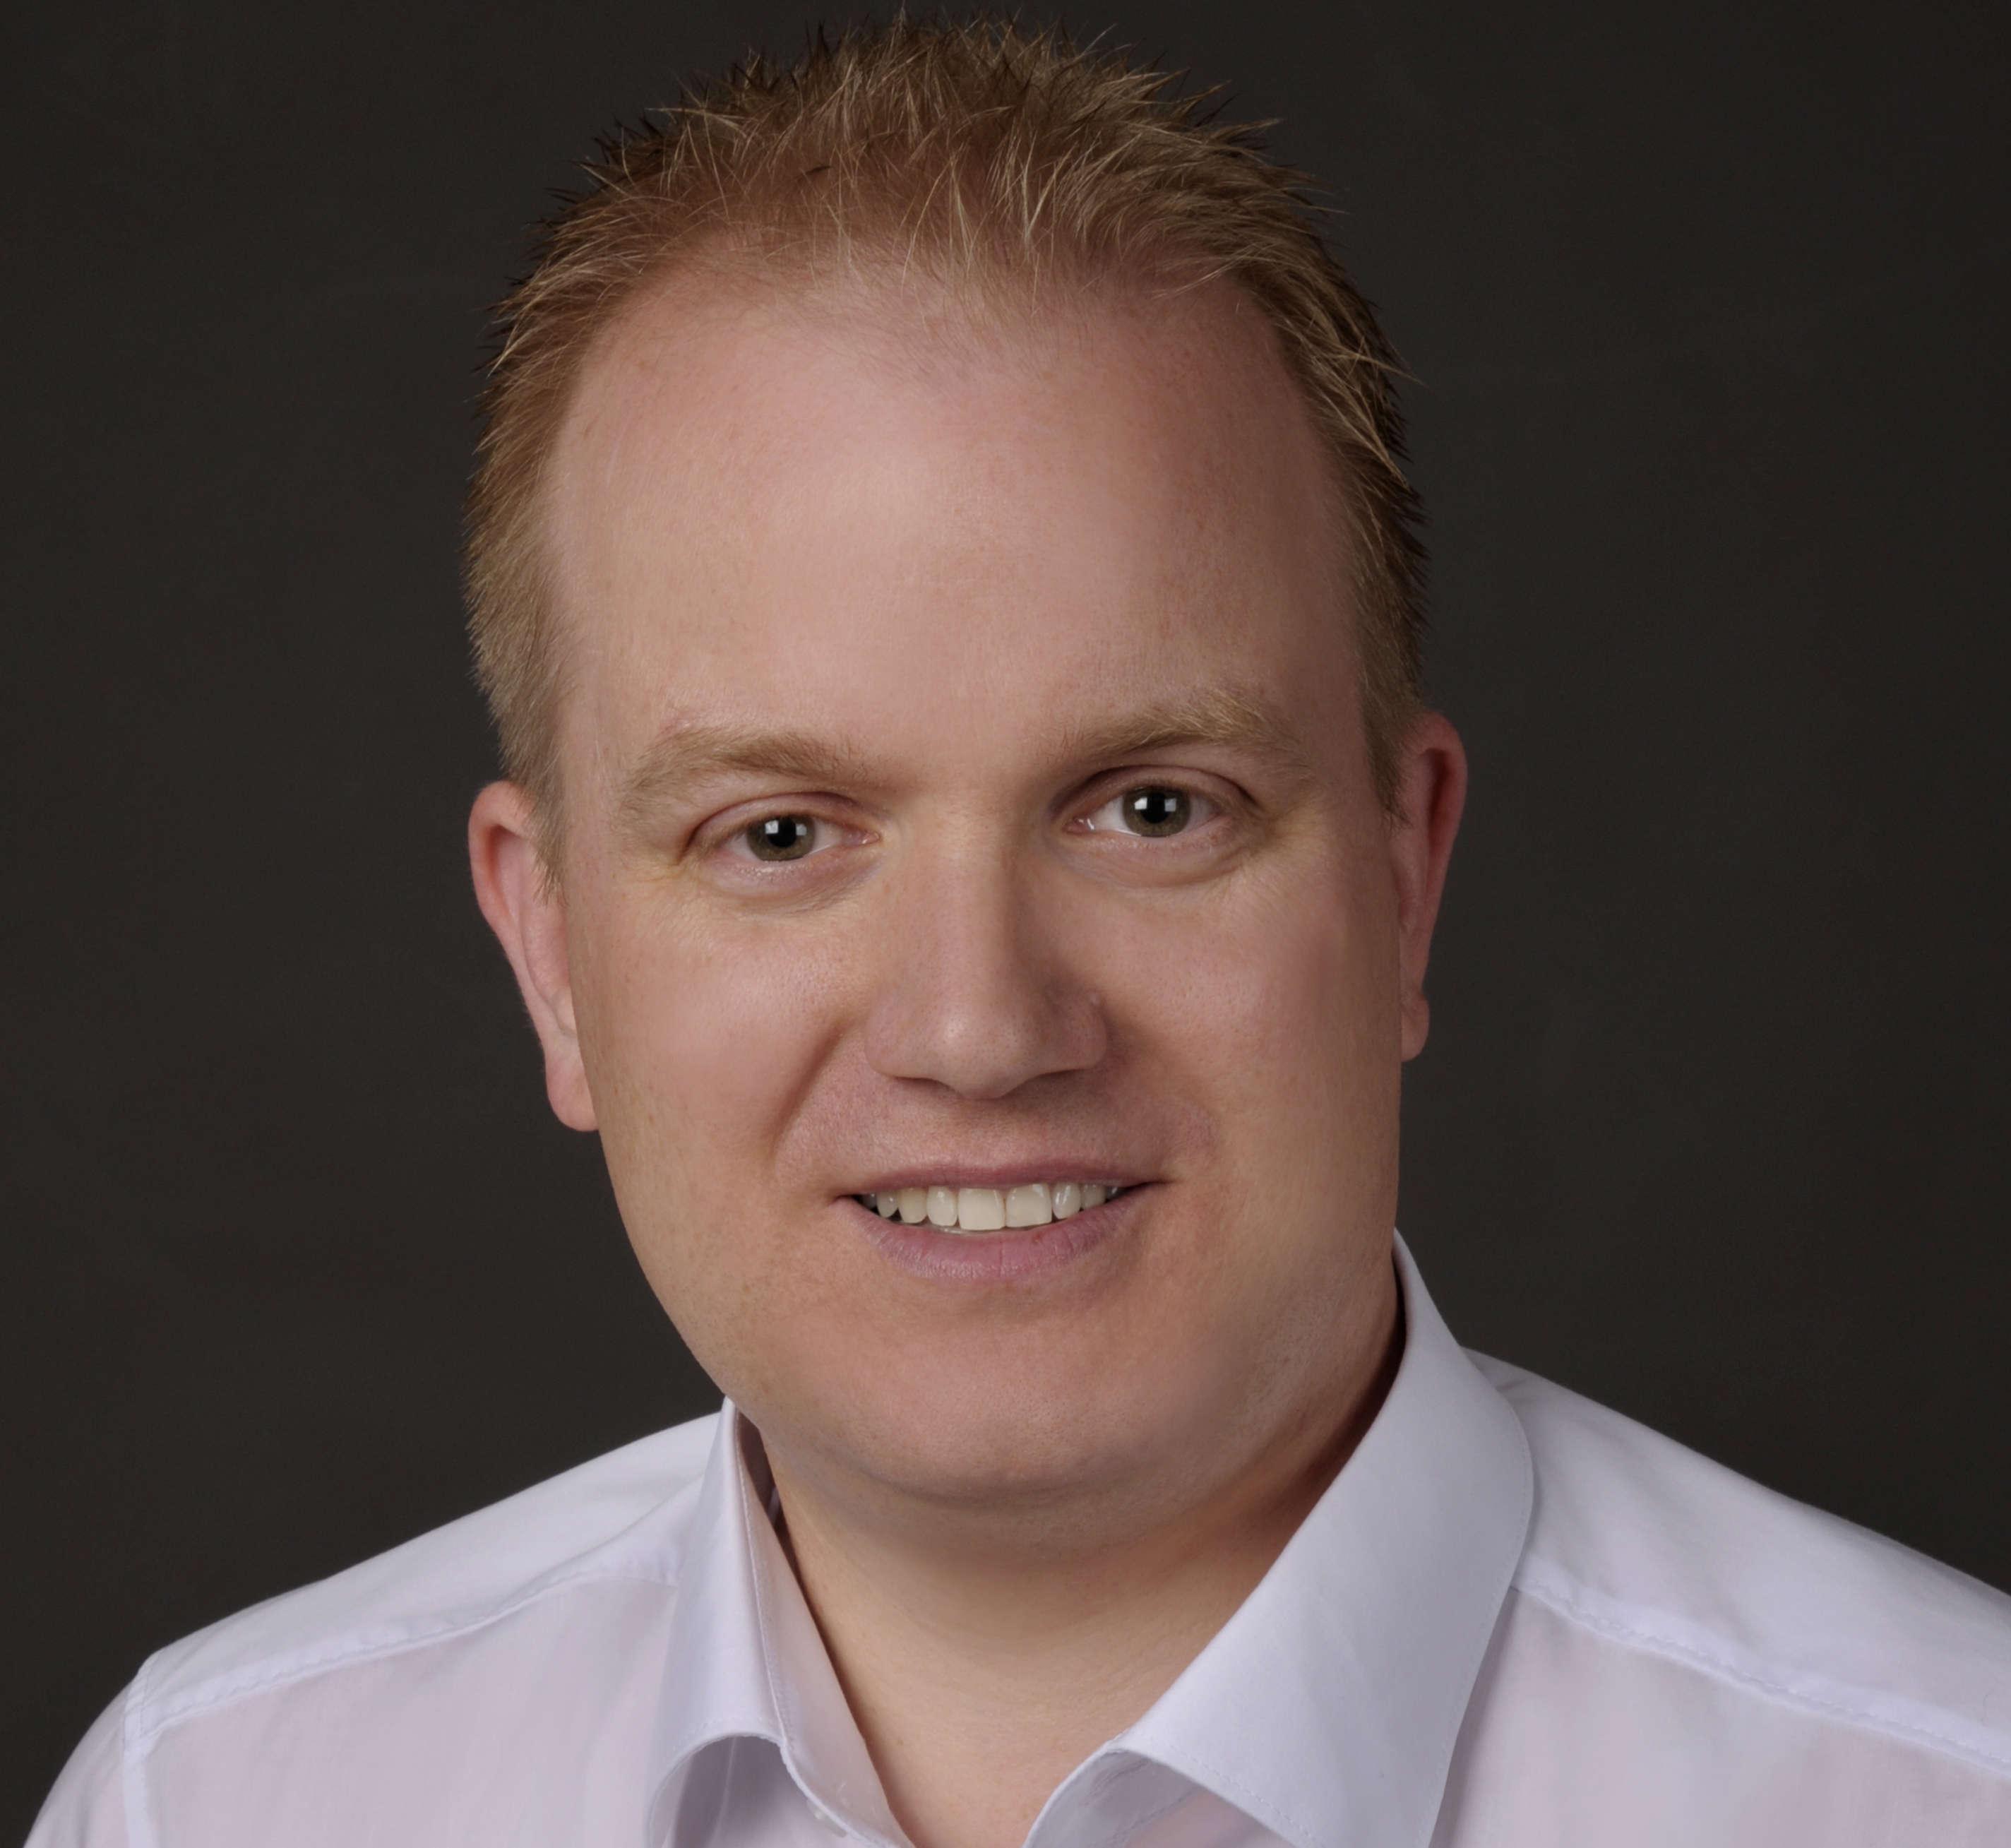 Christoph Hahn